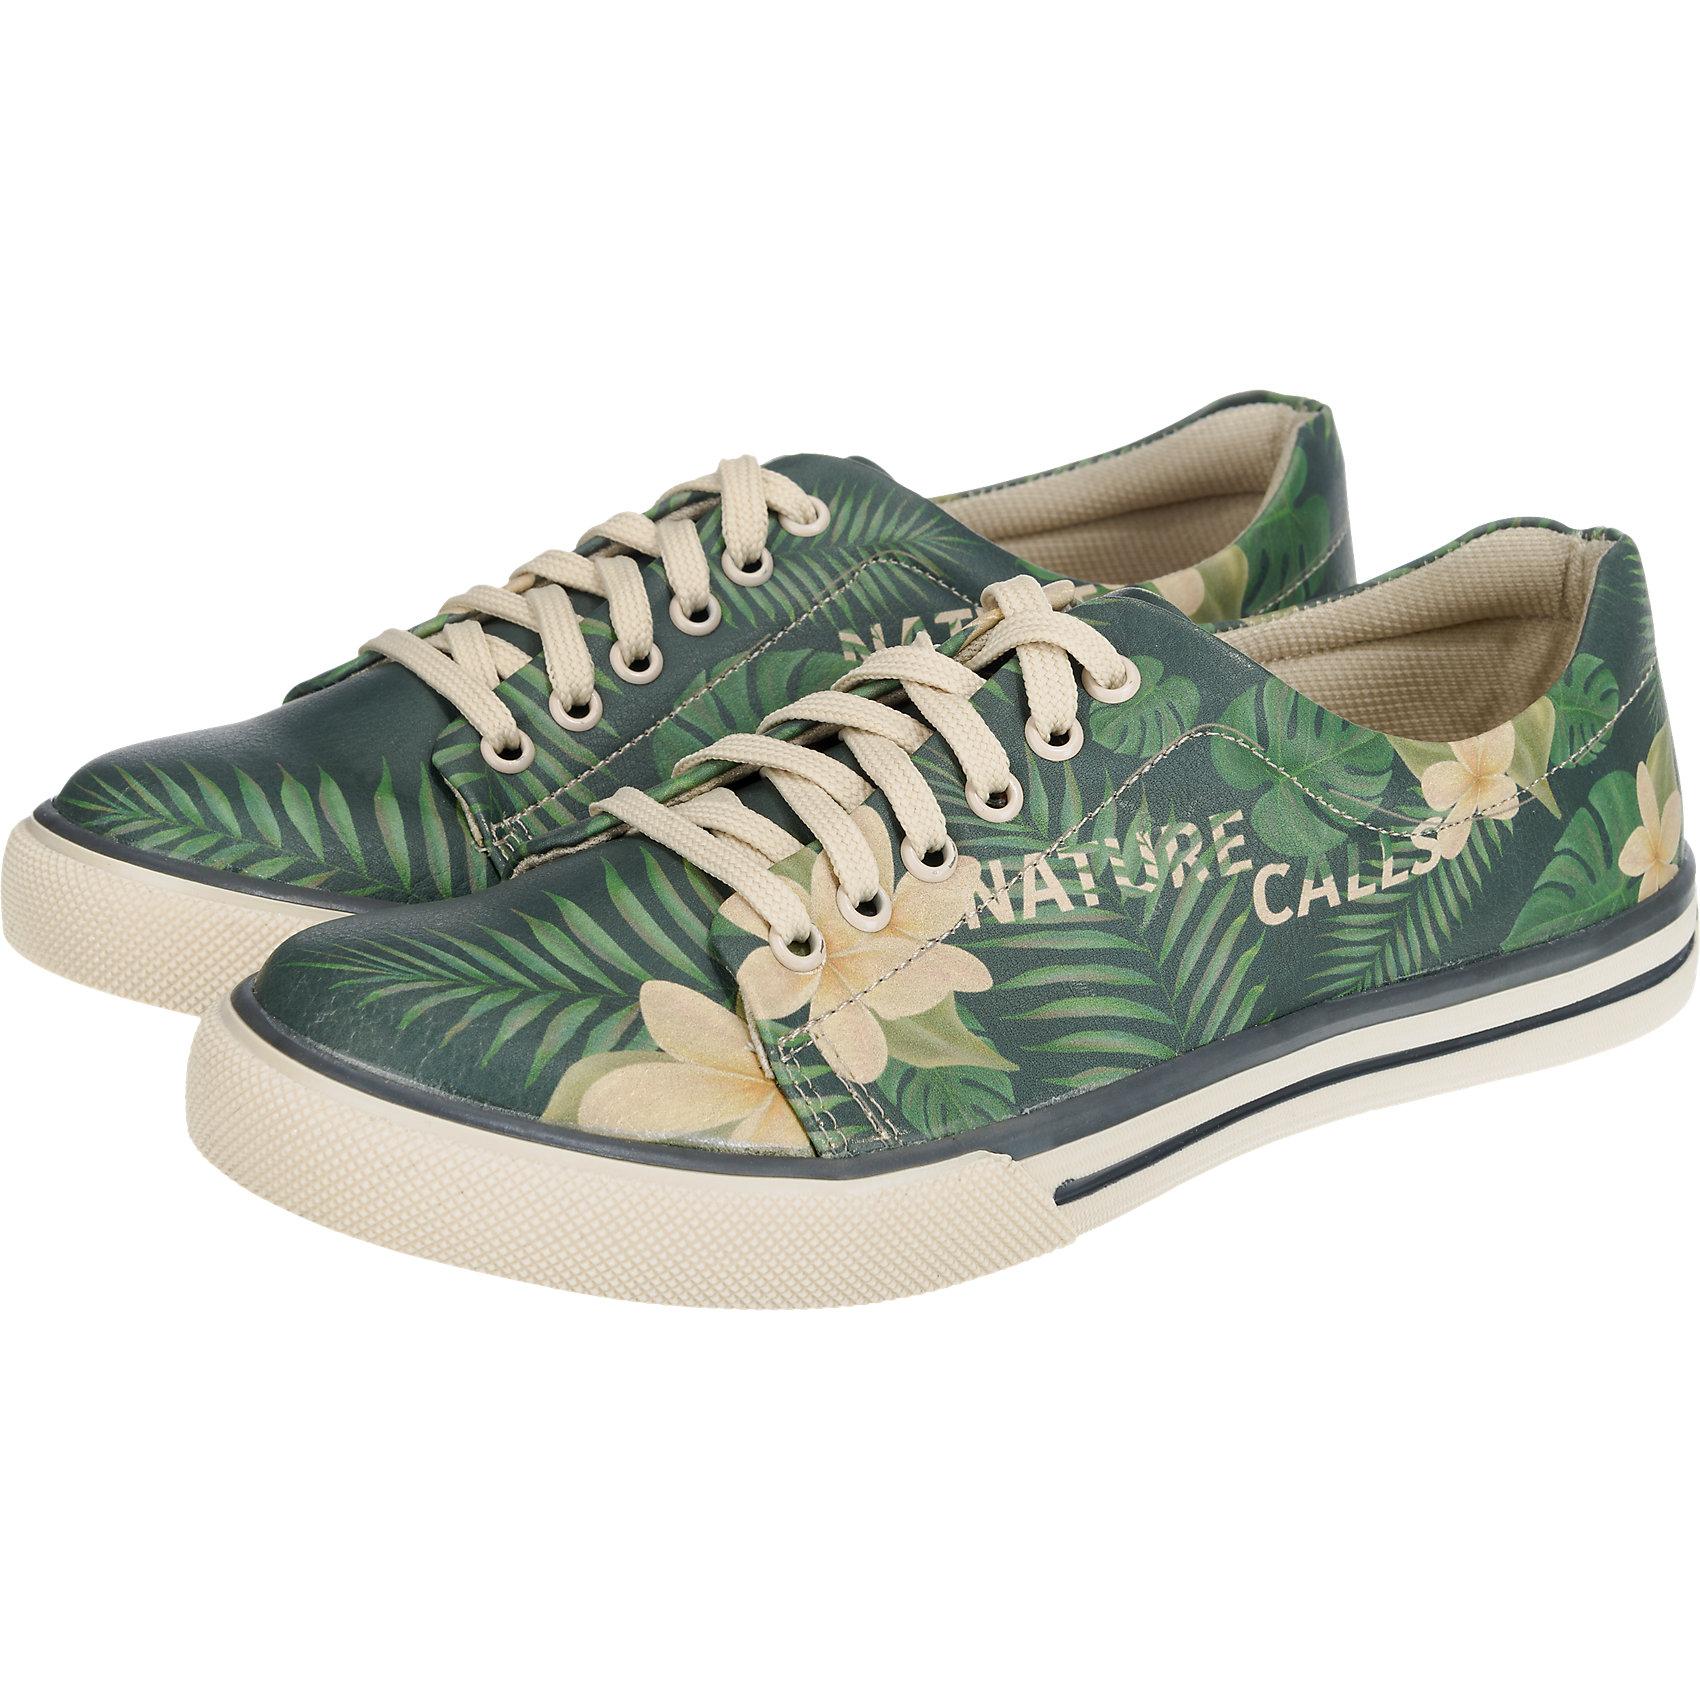 Details zu Neu Dogo Shoes Nature Calls Sneakers 5775281 für Damen mehrfarbig